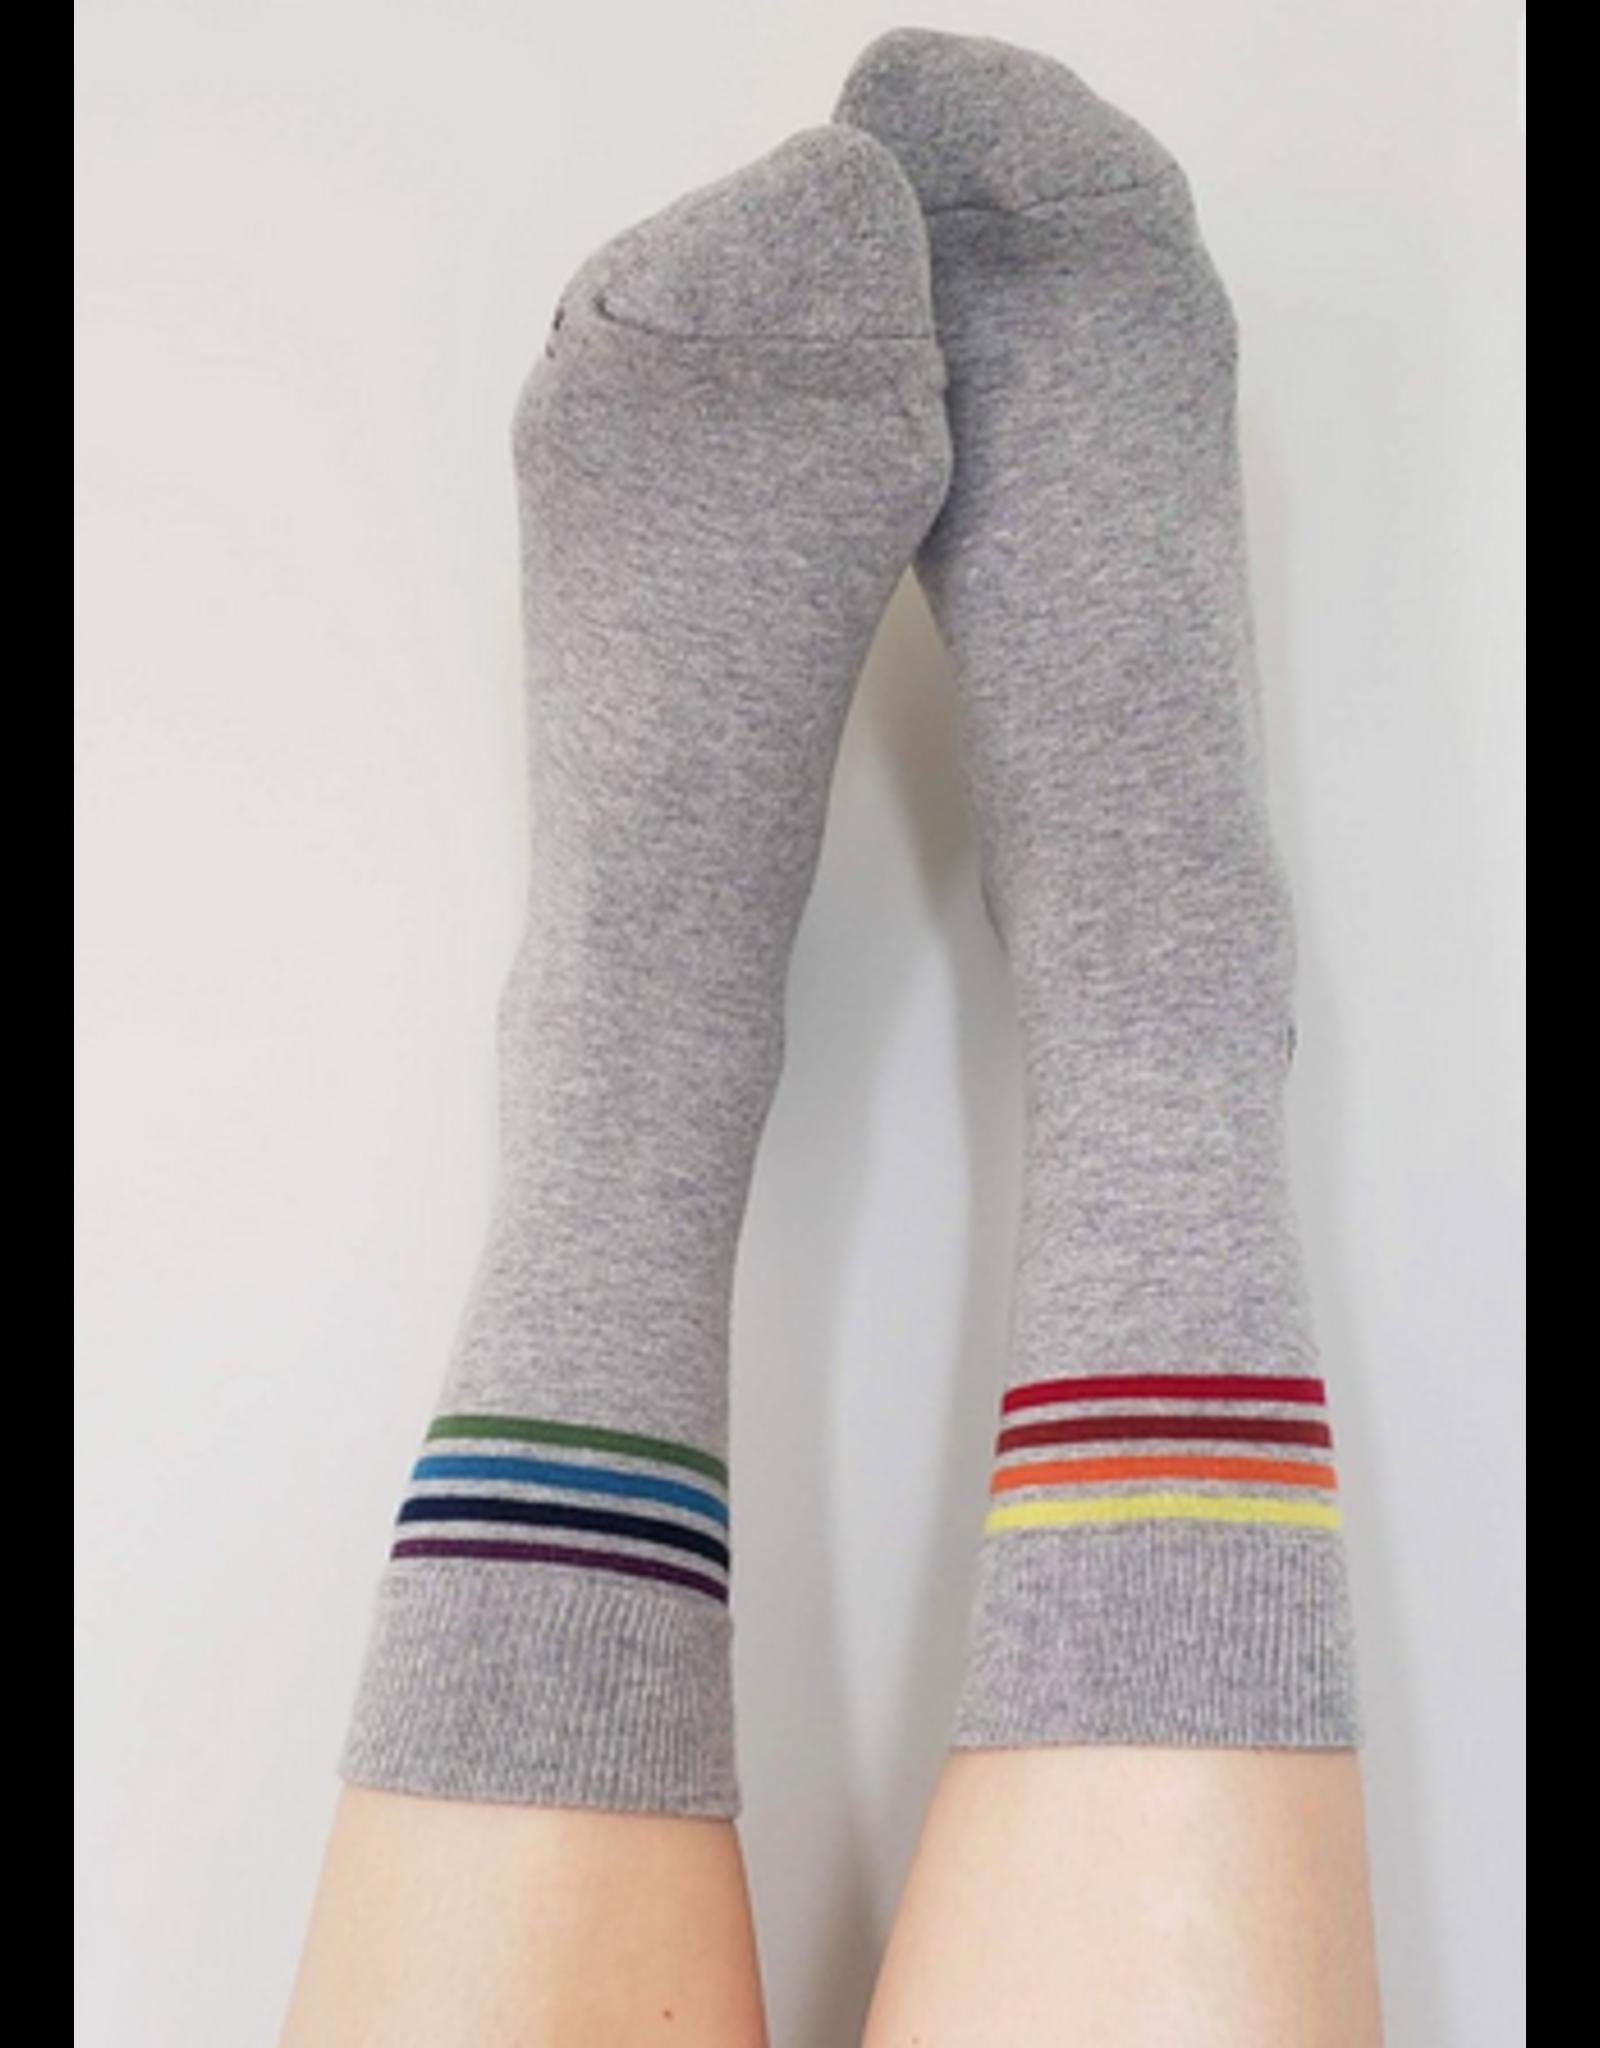 Conscious Step Socks that Save LGBTQ Lives- Medium Grey